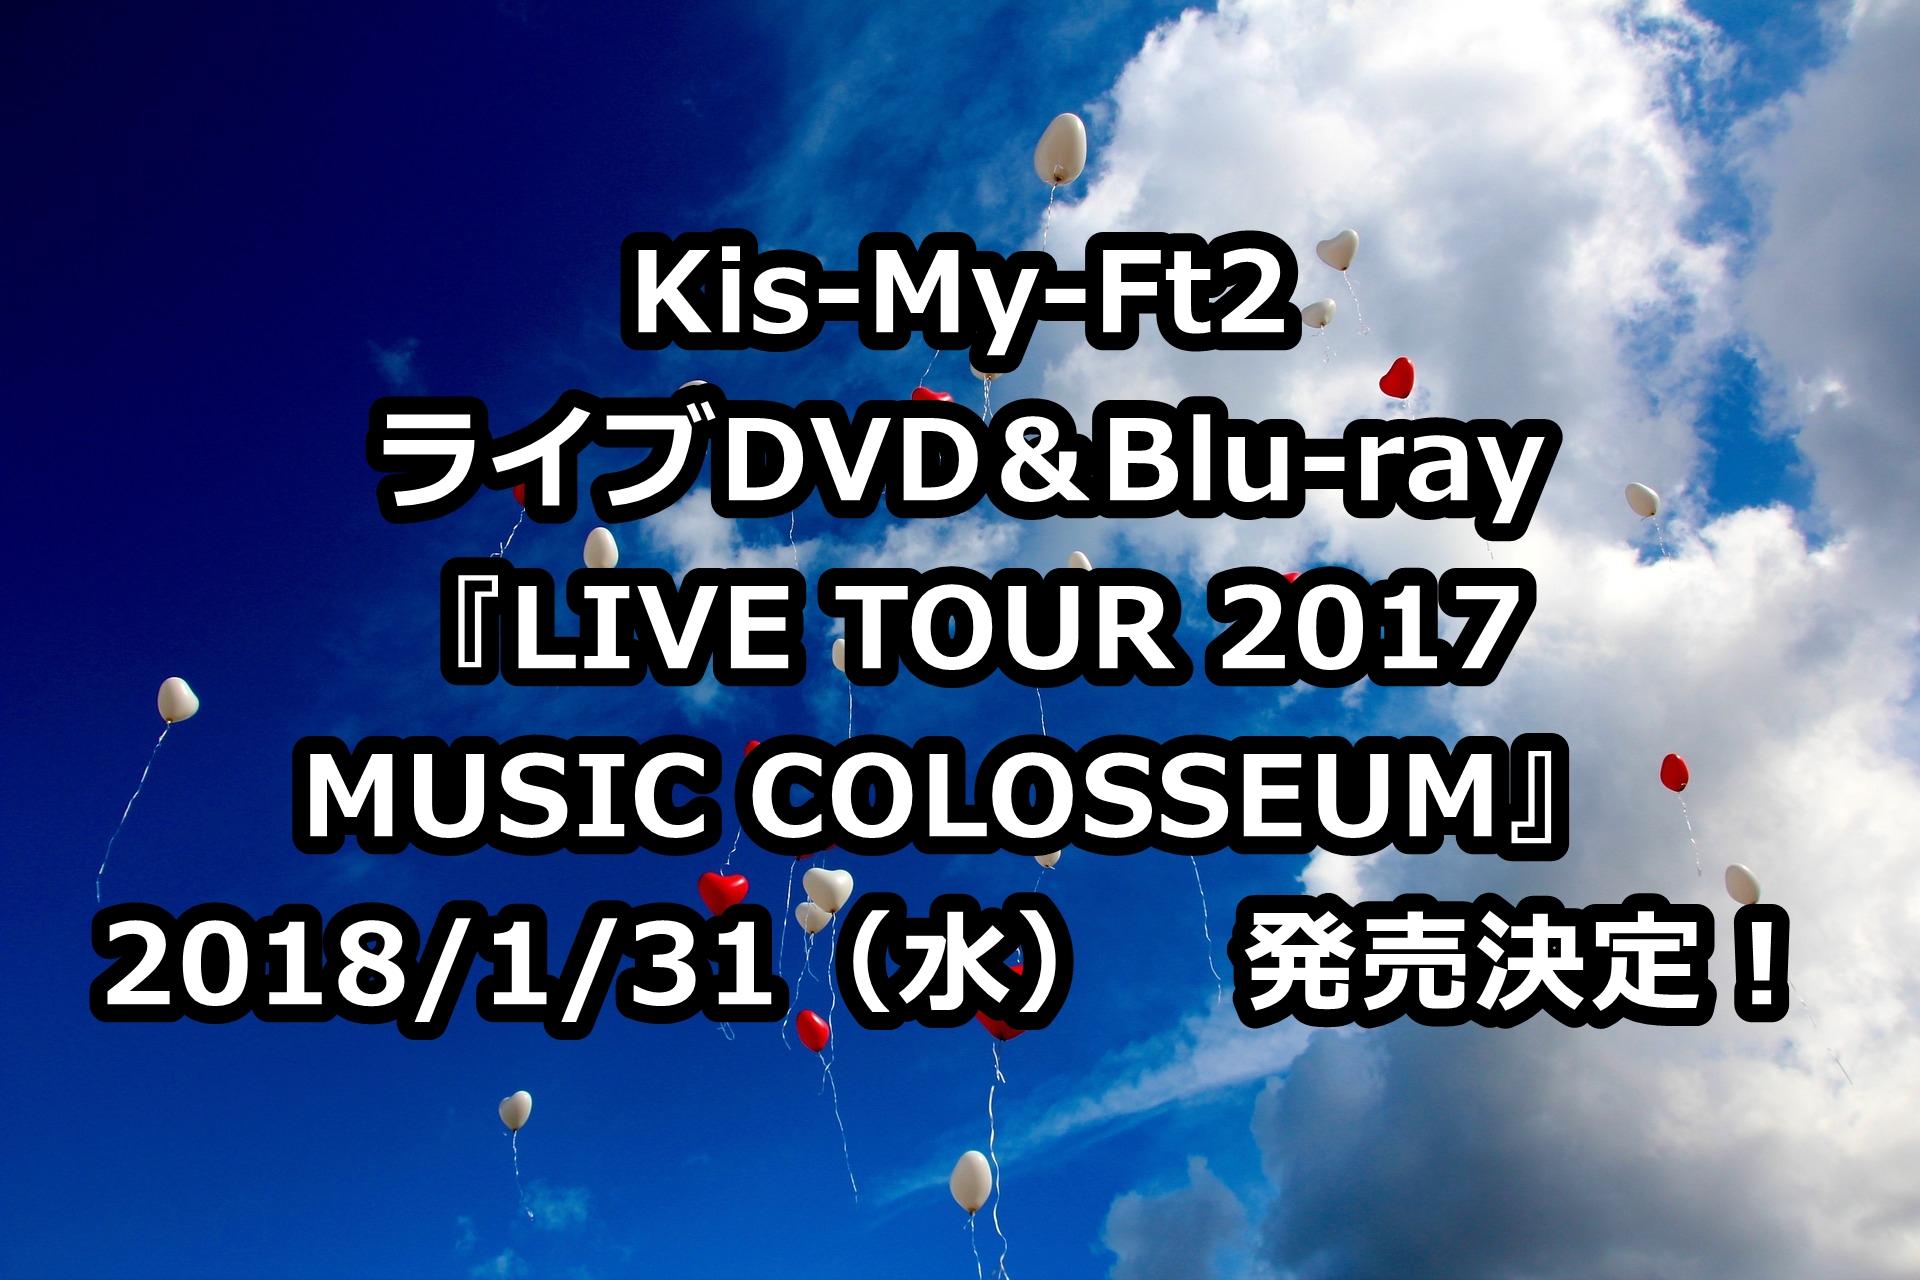 Kis-My-Ft2(キスマイ)ライブDVD予約・特典案内!最新「2017MUSIC COLOSSEUM」収録曲、最安値など徹底解説